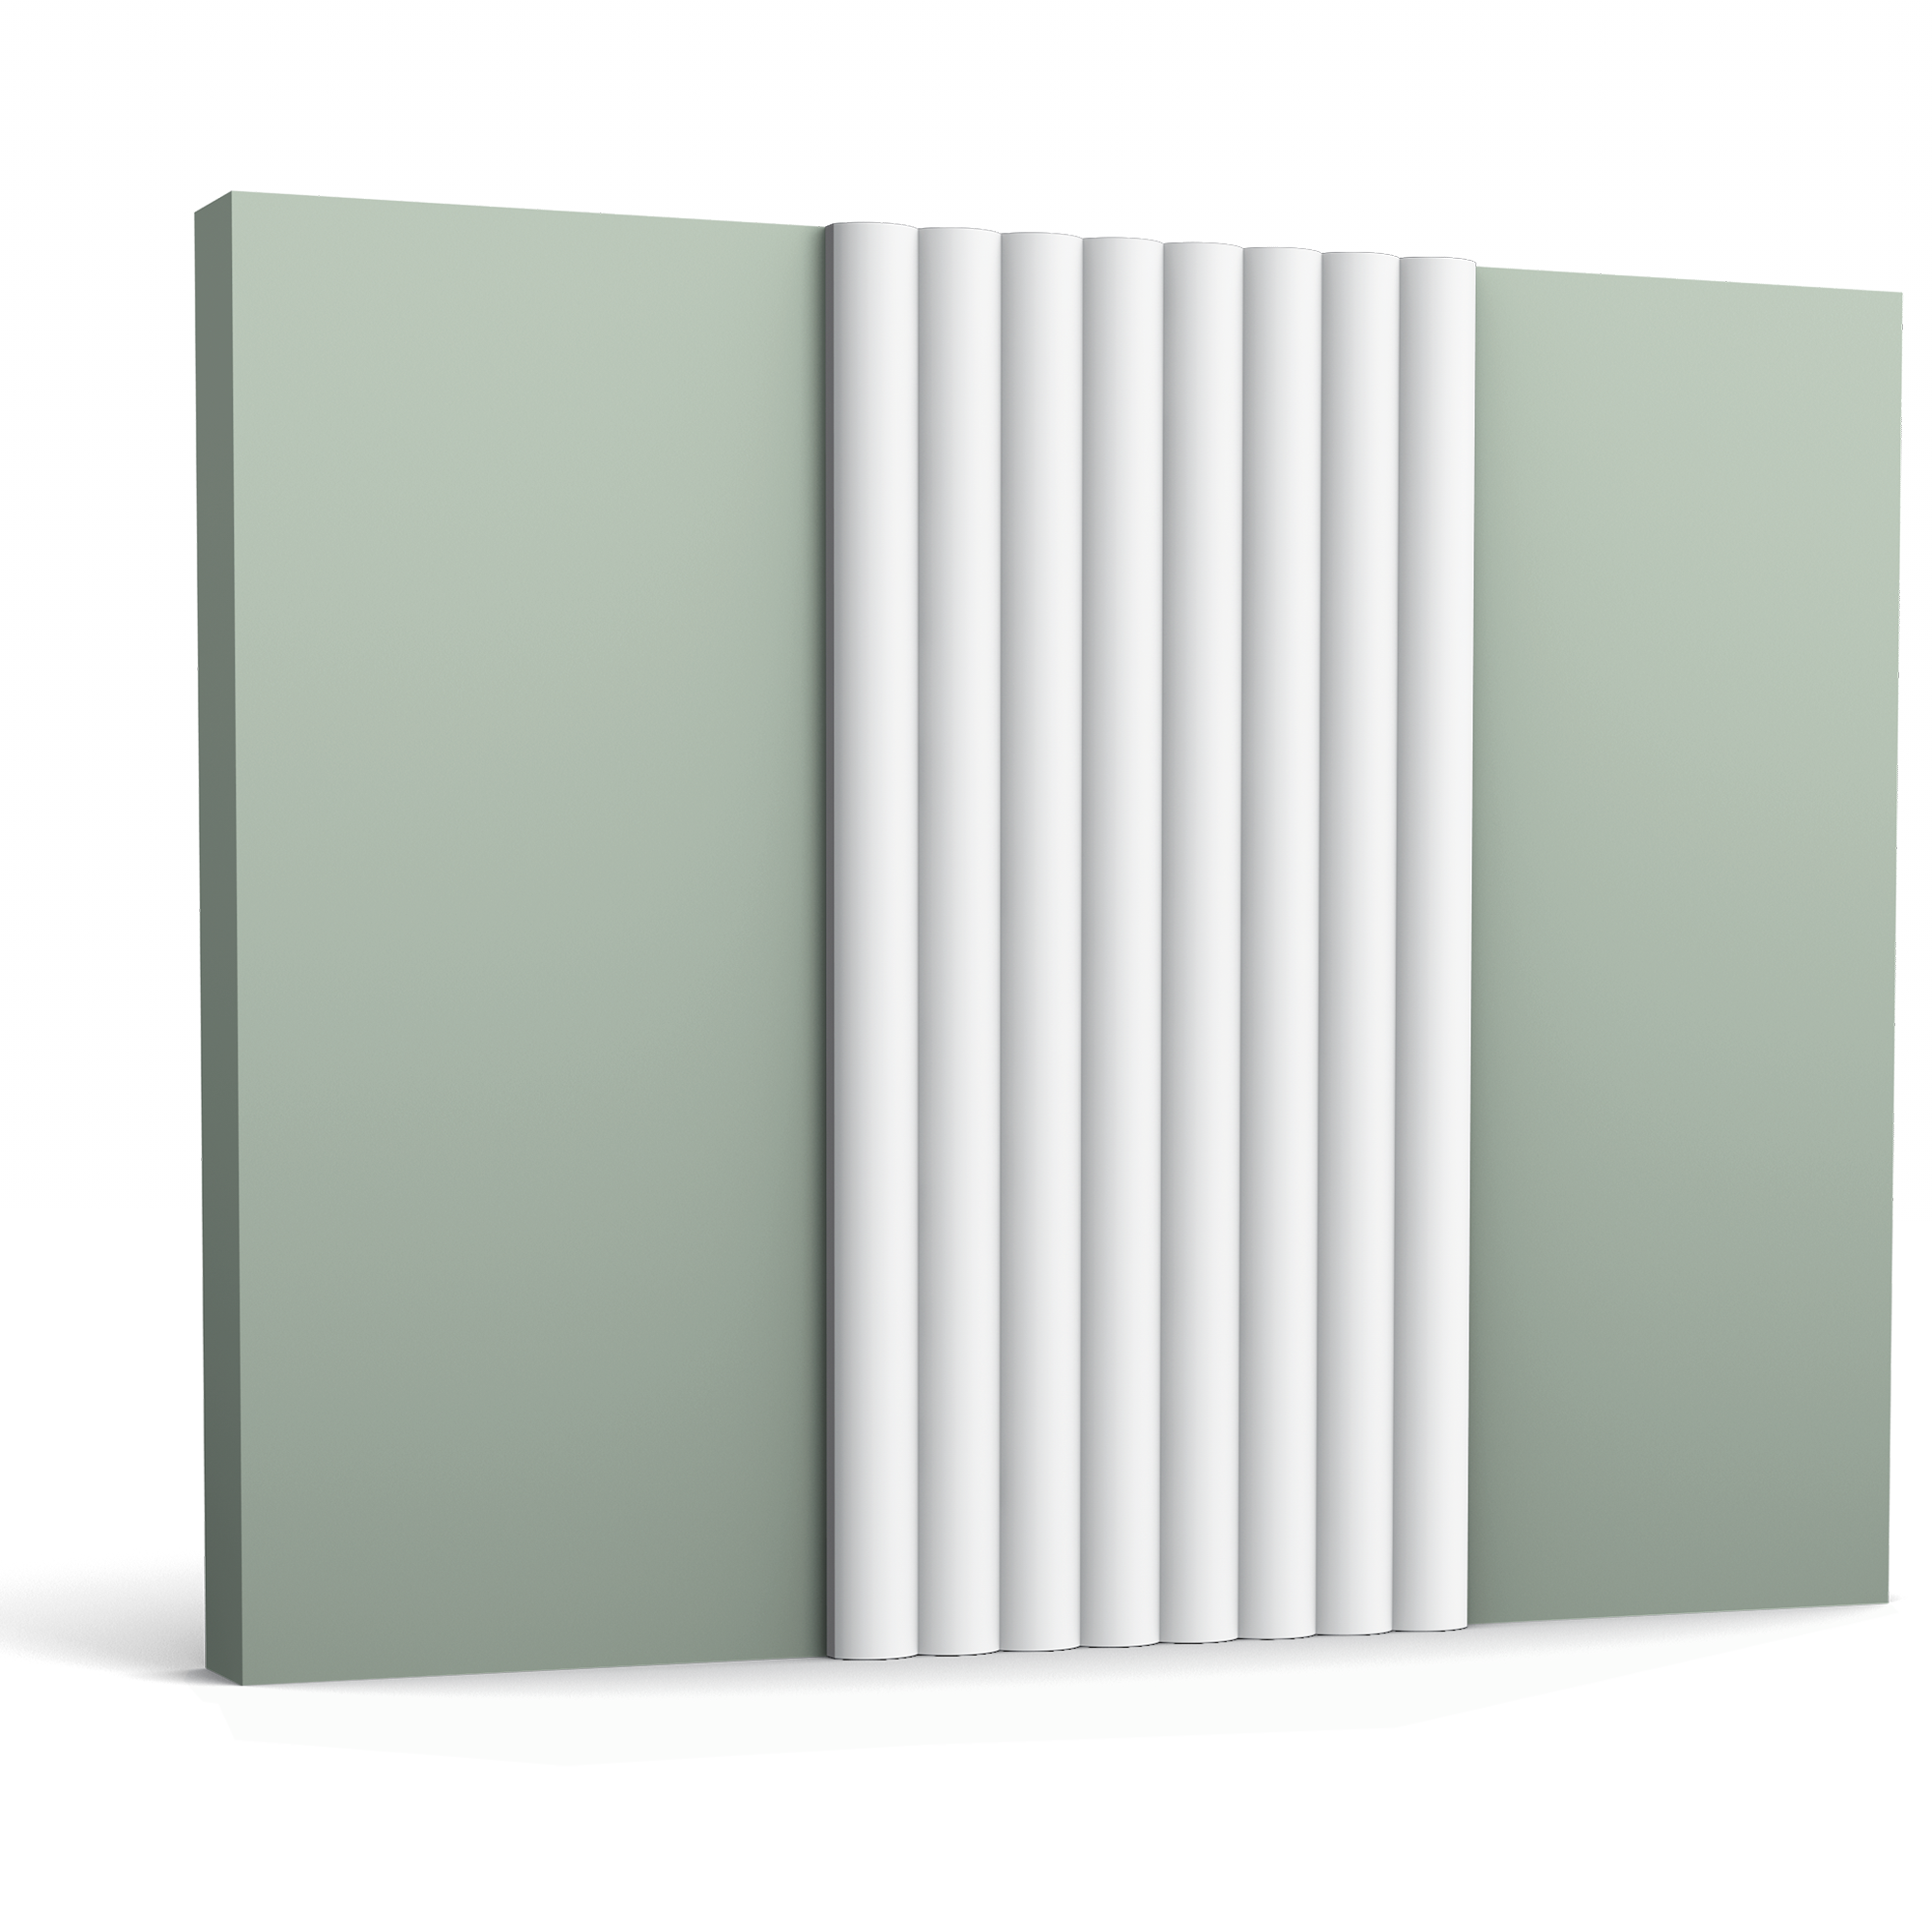 Ohybný dekoračný 3D panel Orac Decor W110F FLEX HILL